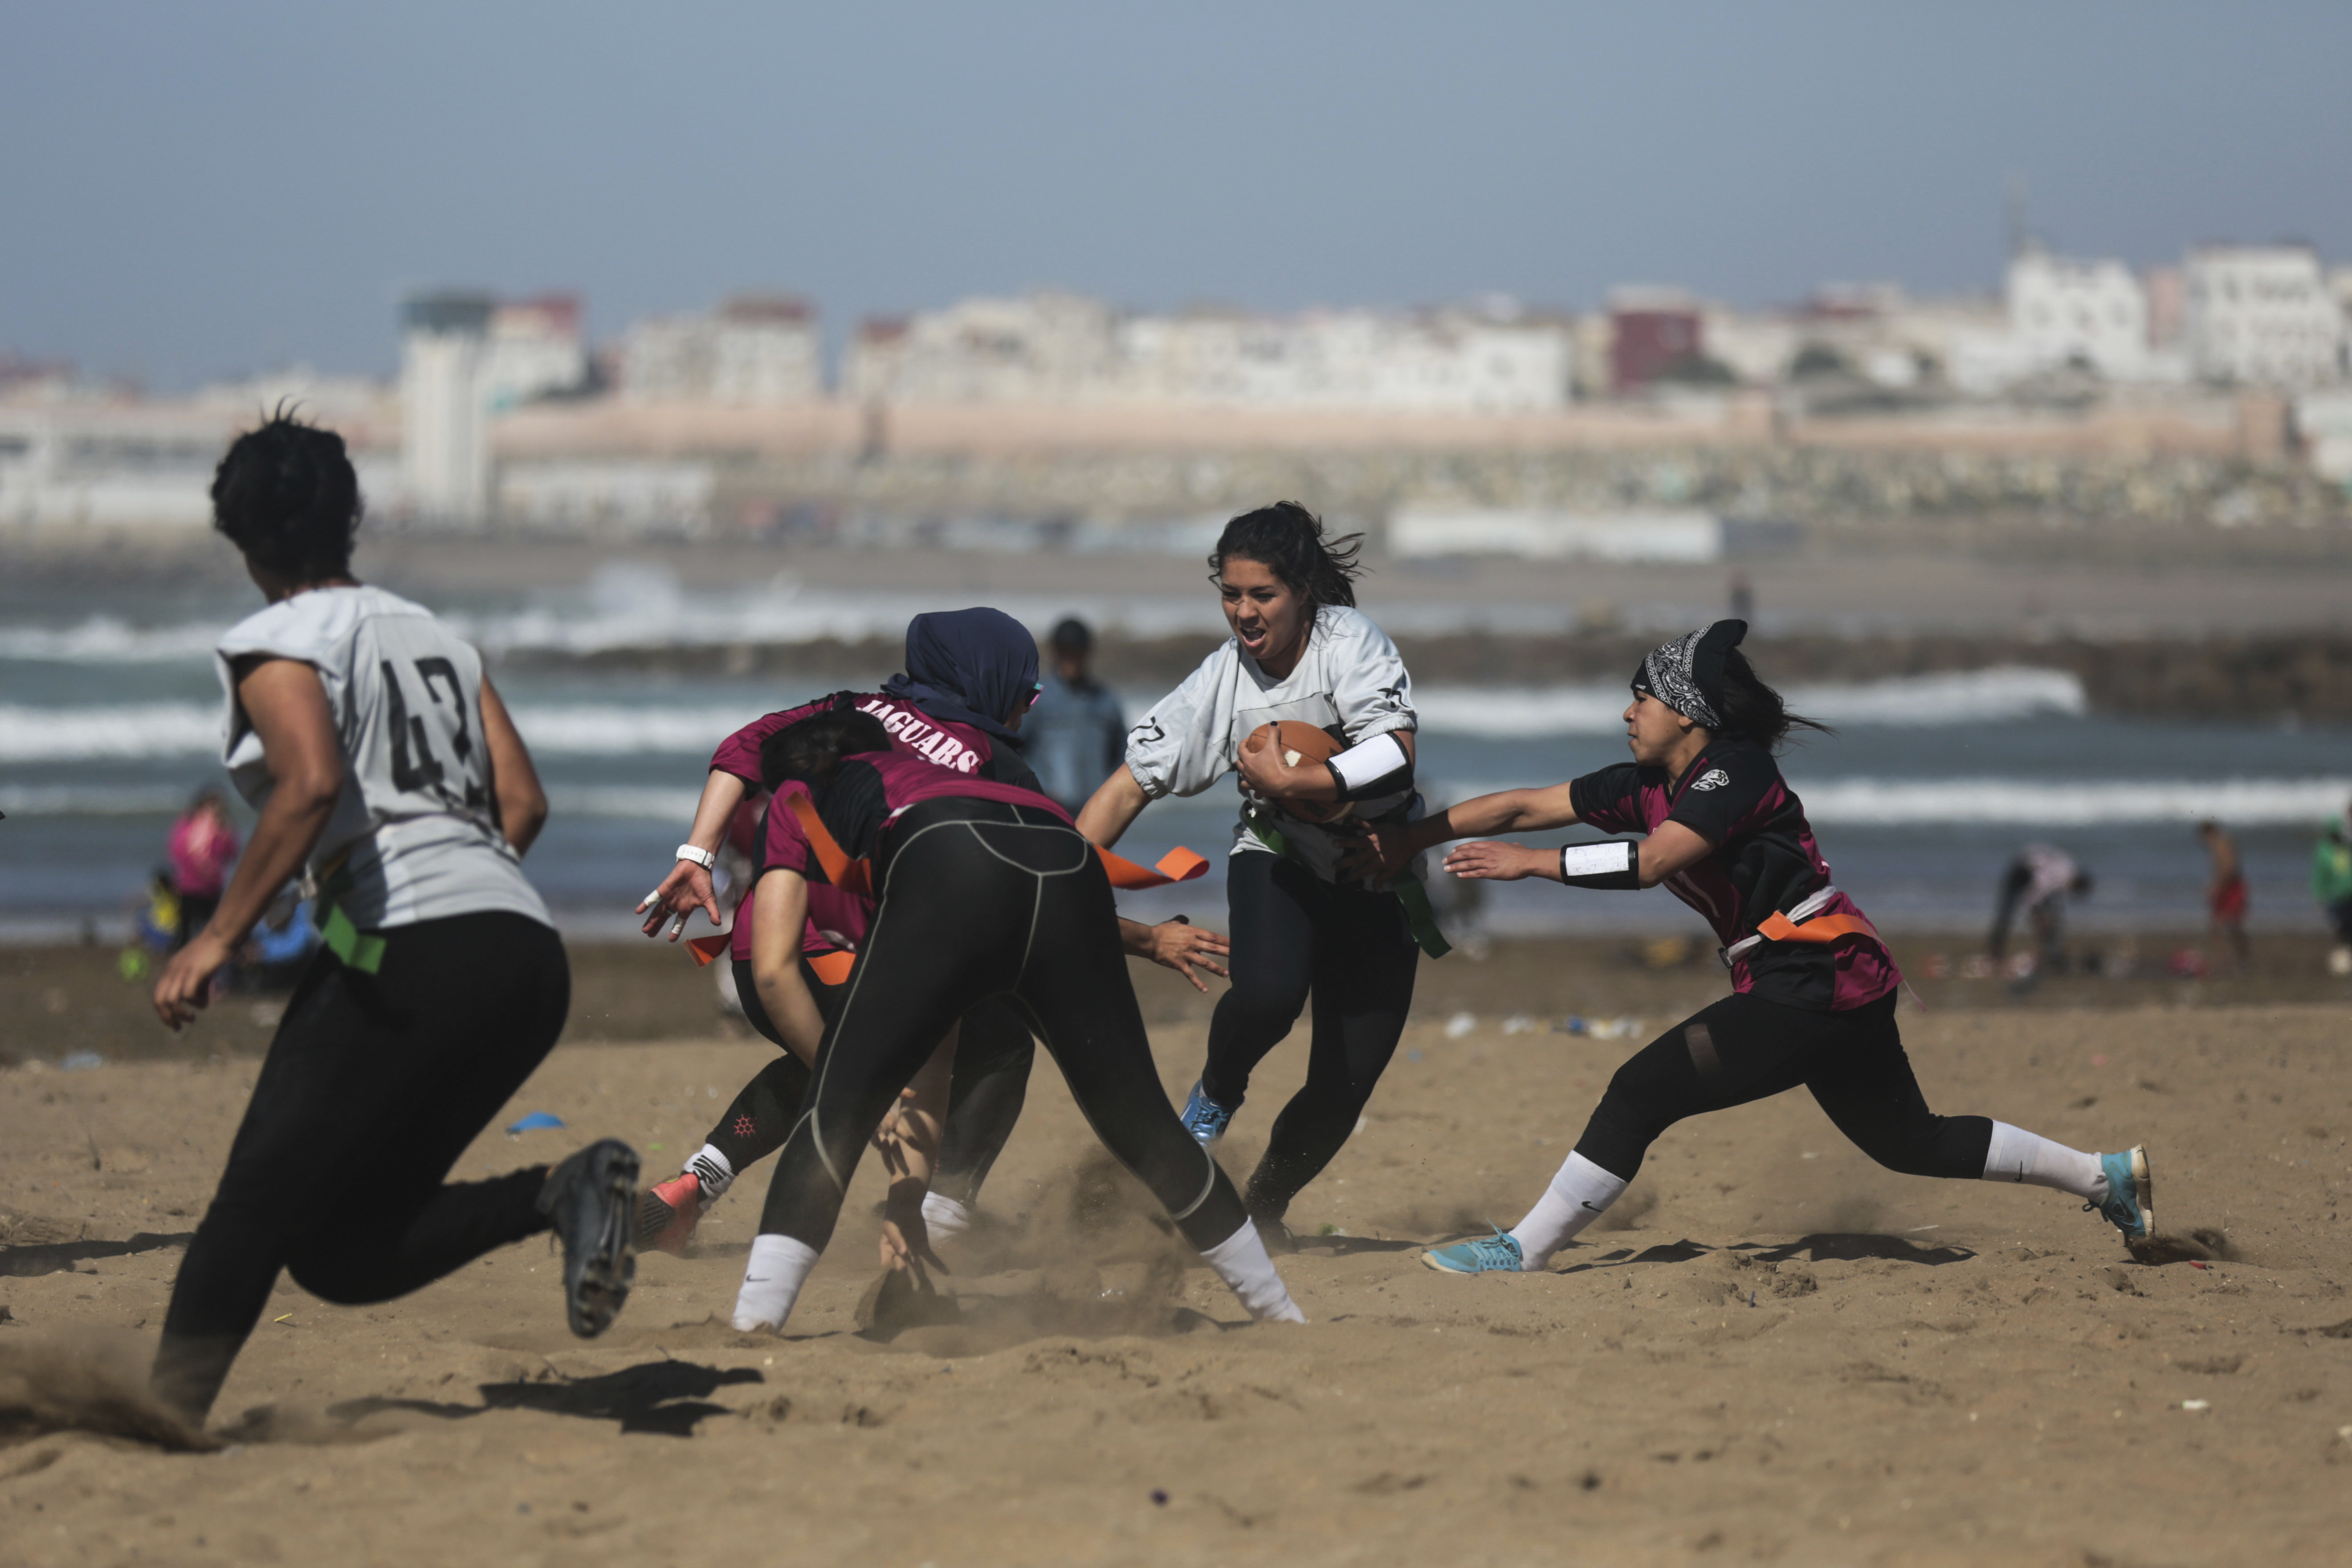 "<div class=""meta image-caption""><div class=""origin-logo origin-image ap""><span>AP</span></div><span class=""caption-text"">Girls play flag football on a beach in Rabat, Morocco (AP)</span></div>"